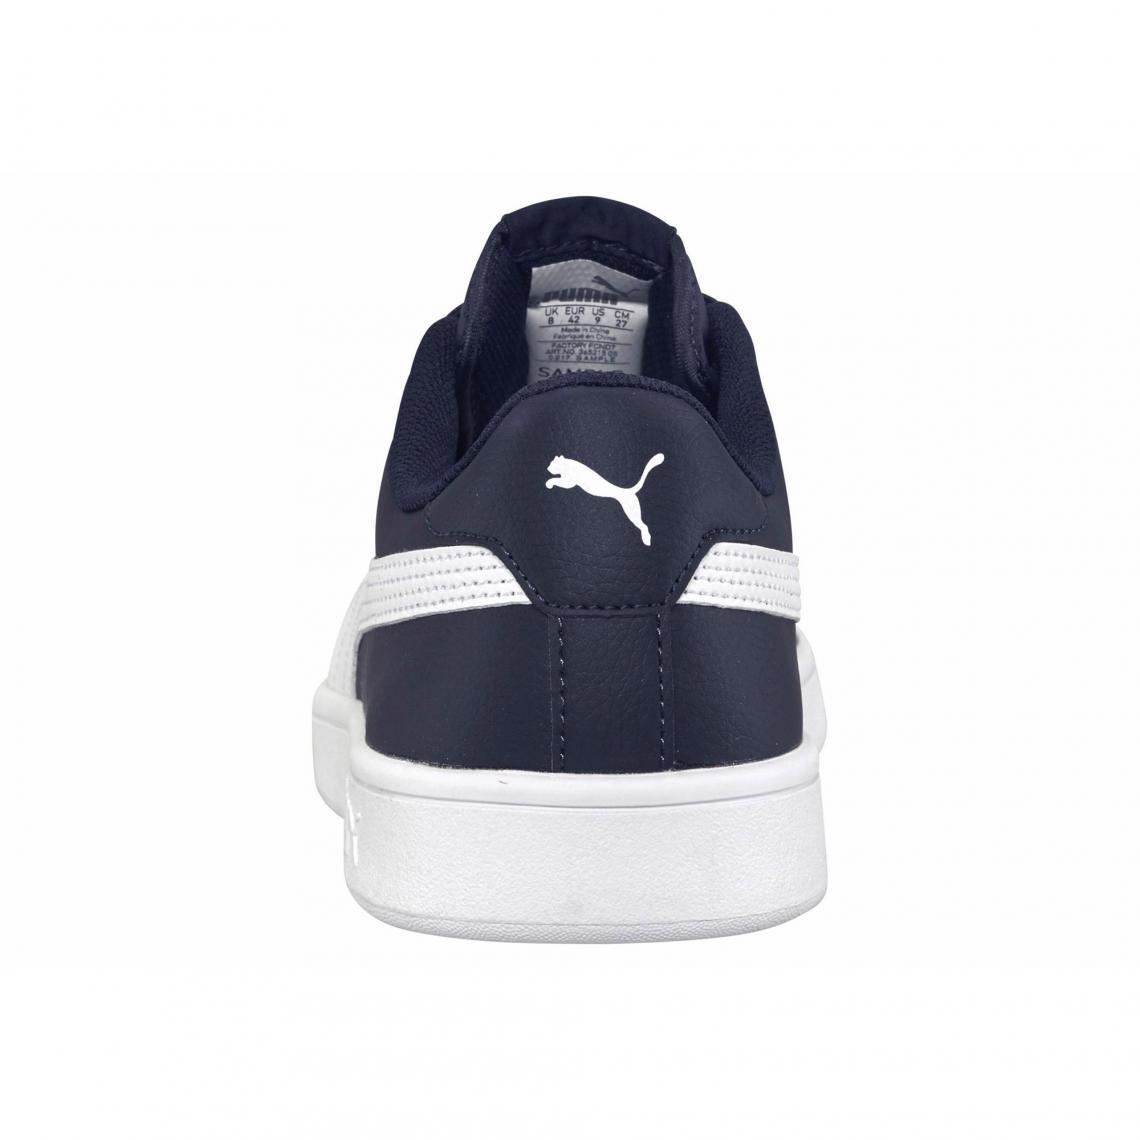 De V2 Puma Chaussures 3suisses Marine Homme Blanc Sport Smash adggqZw